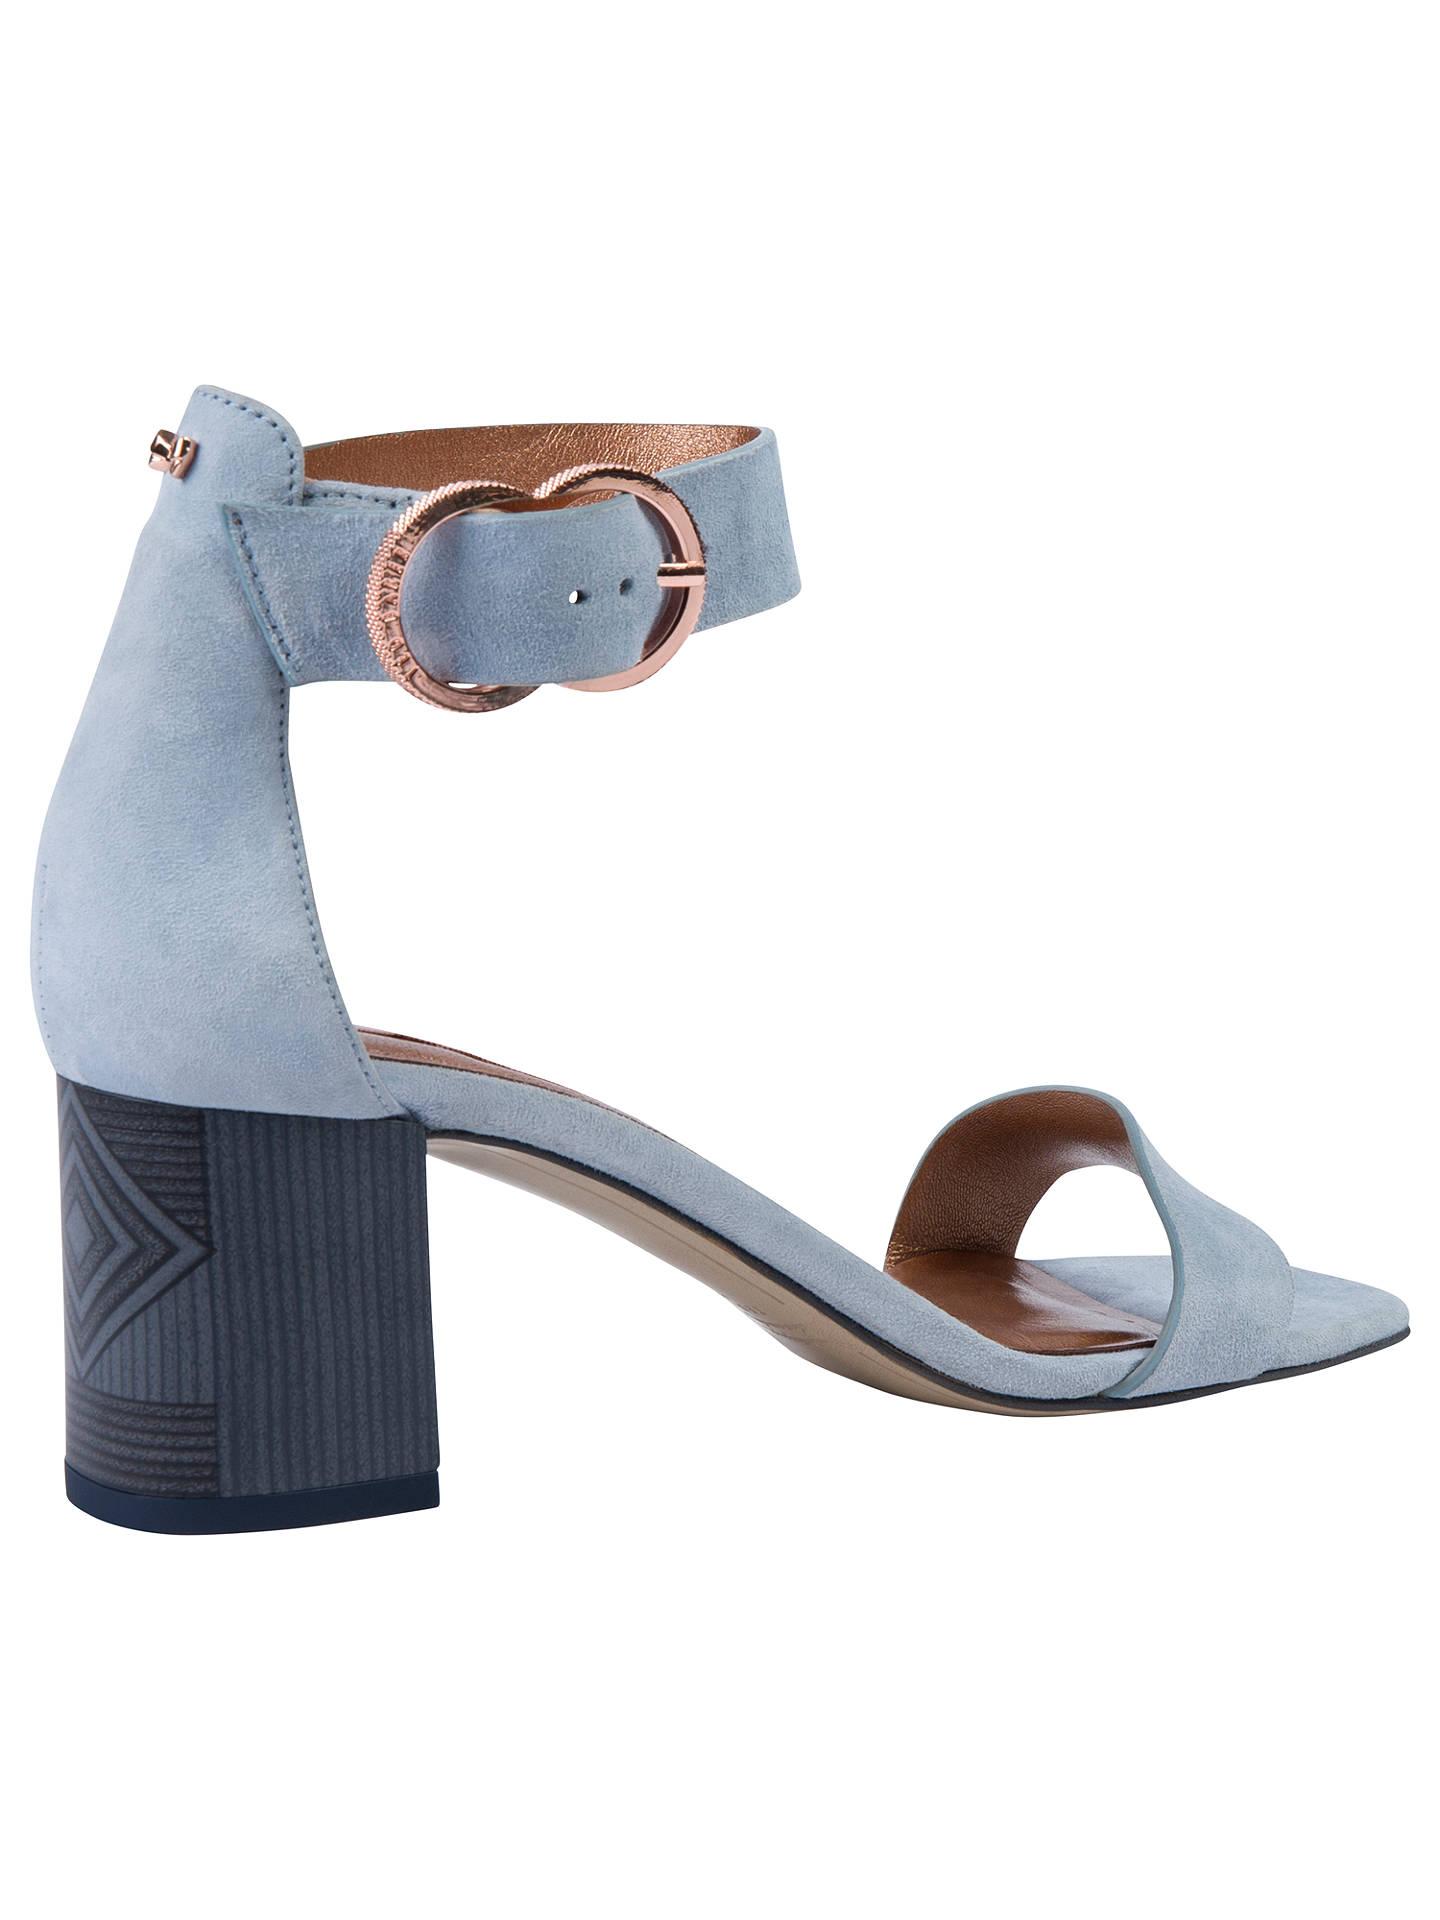 899a76cbcfedfd Ted Baker Qarvas Block Heel Sandals at John Lewis   Partners